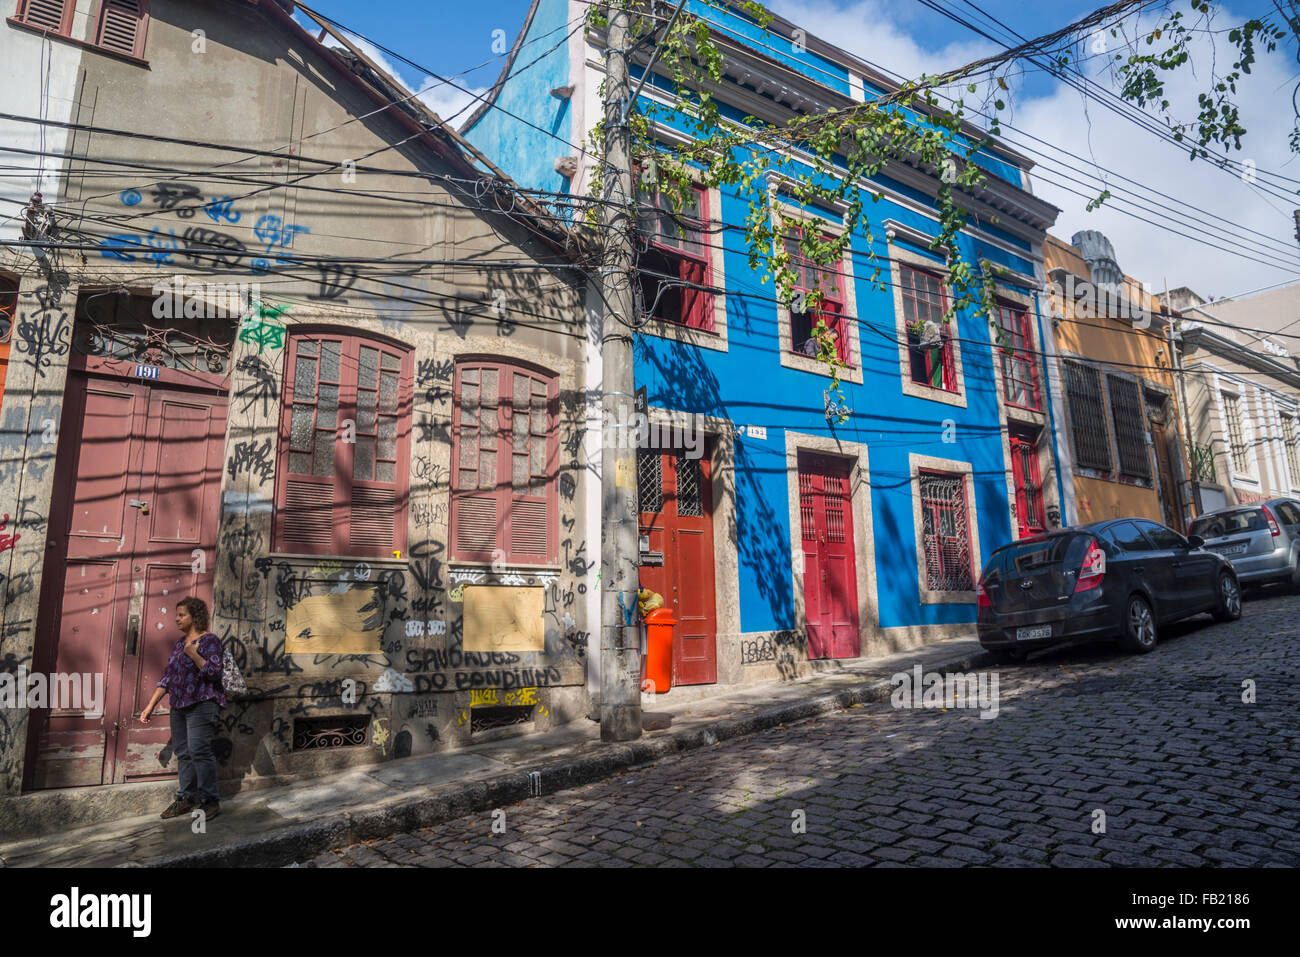 Santa Teresa neighbourhood, Rio de Janeiro, Brazil - Stock Image